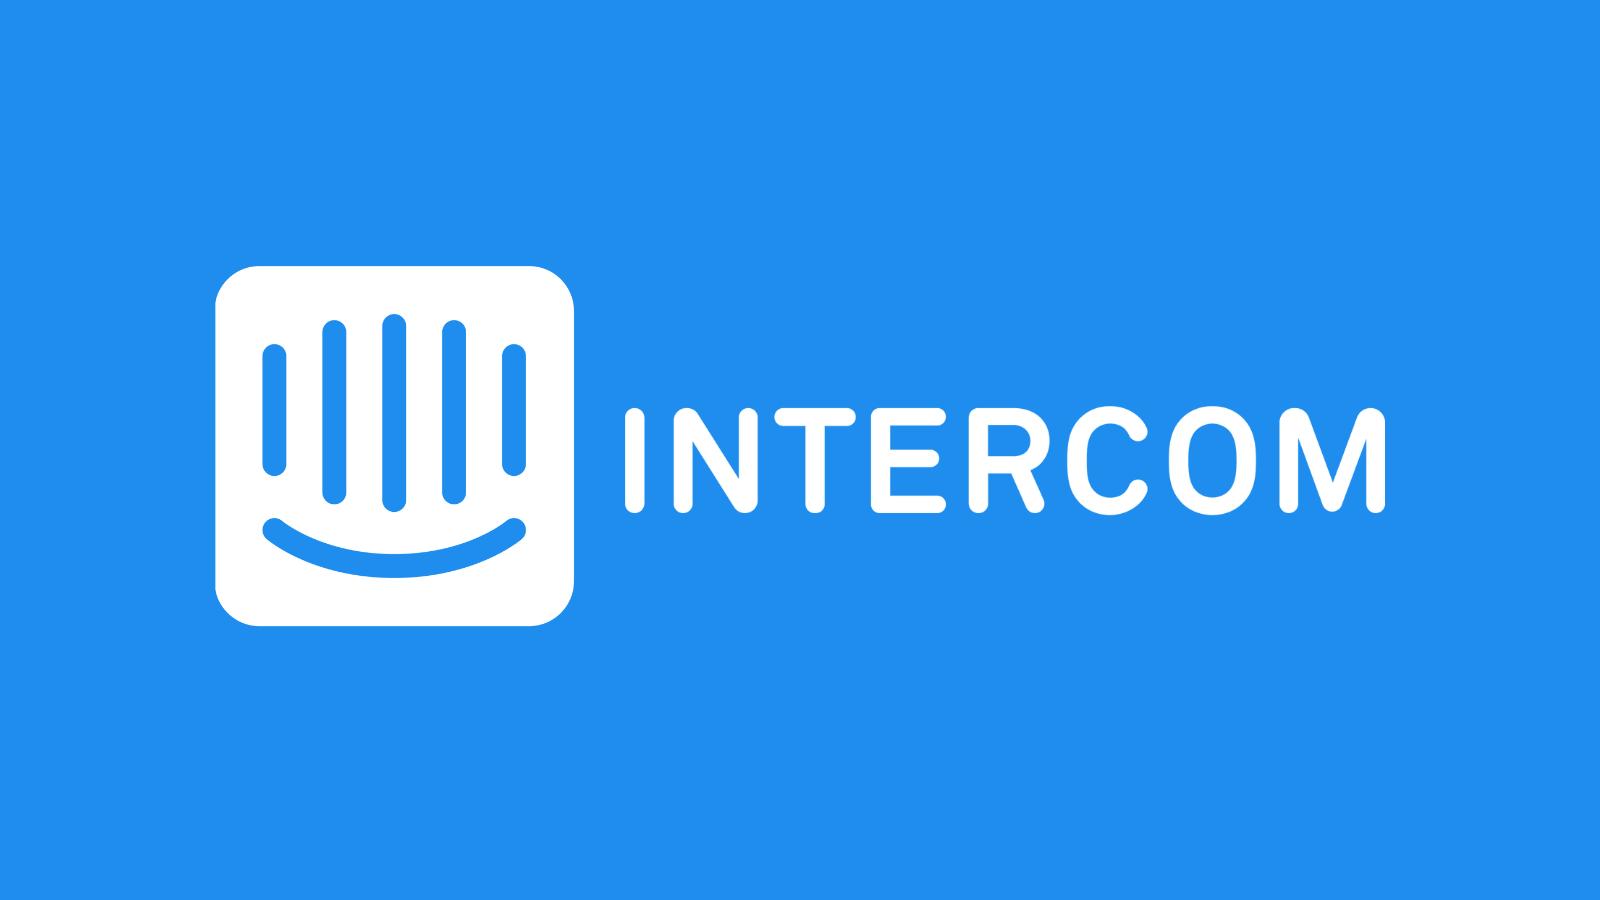 I will customize intercom live chat messenger